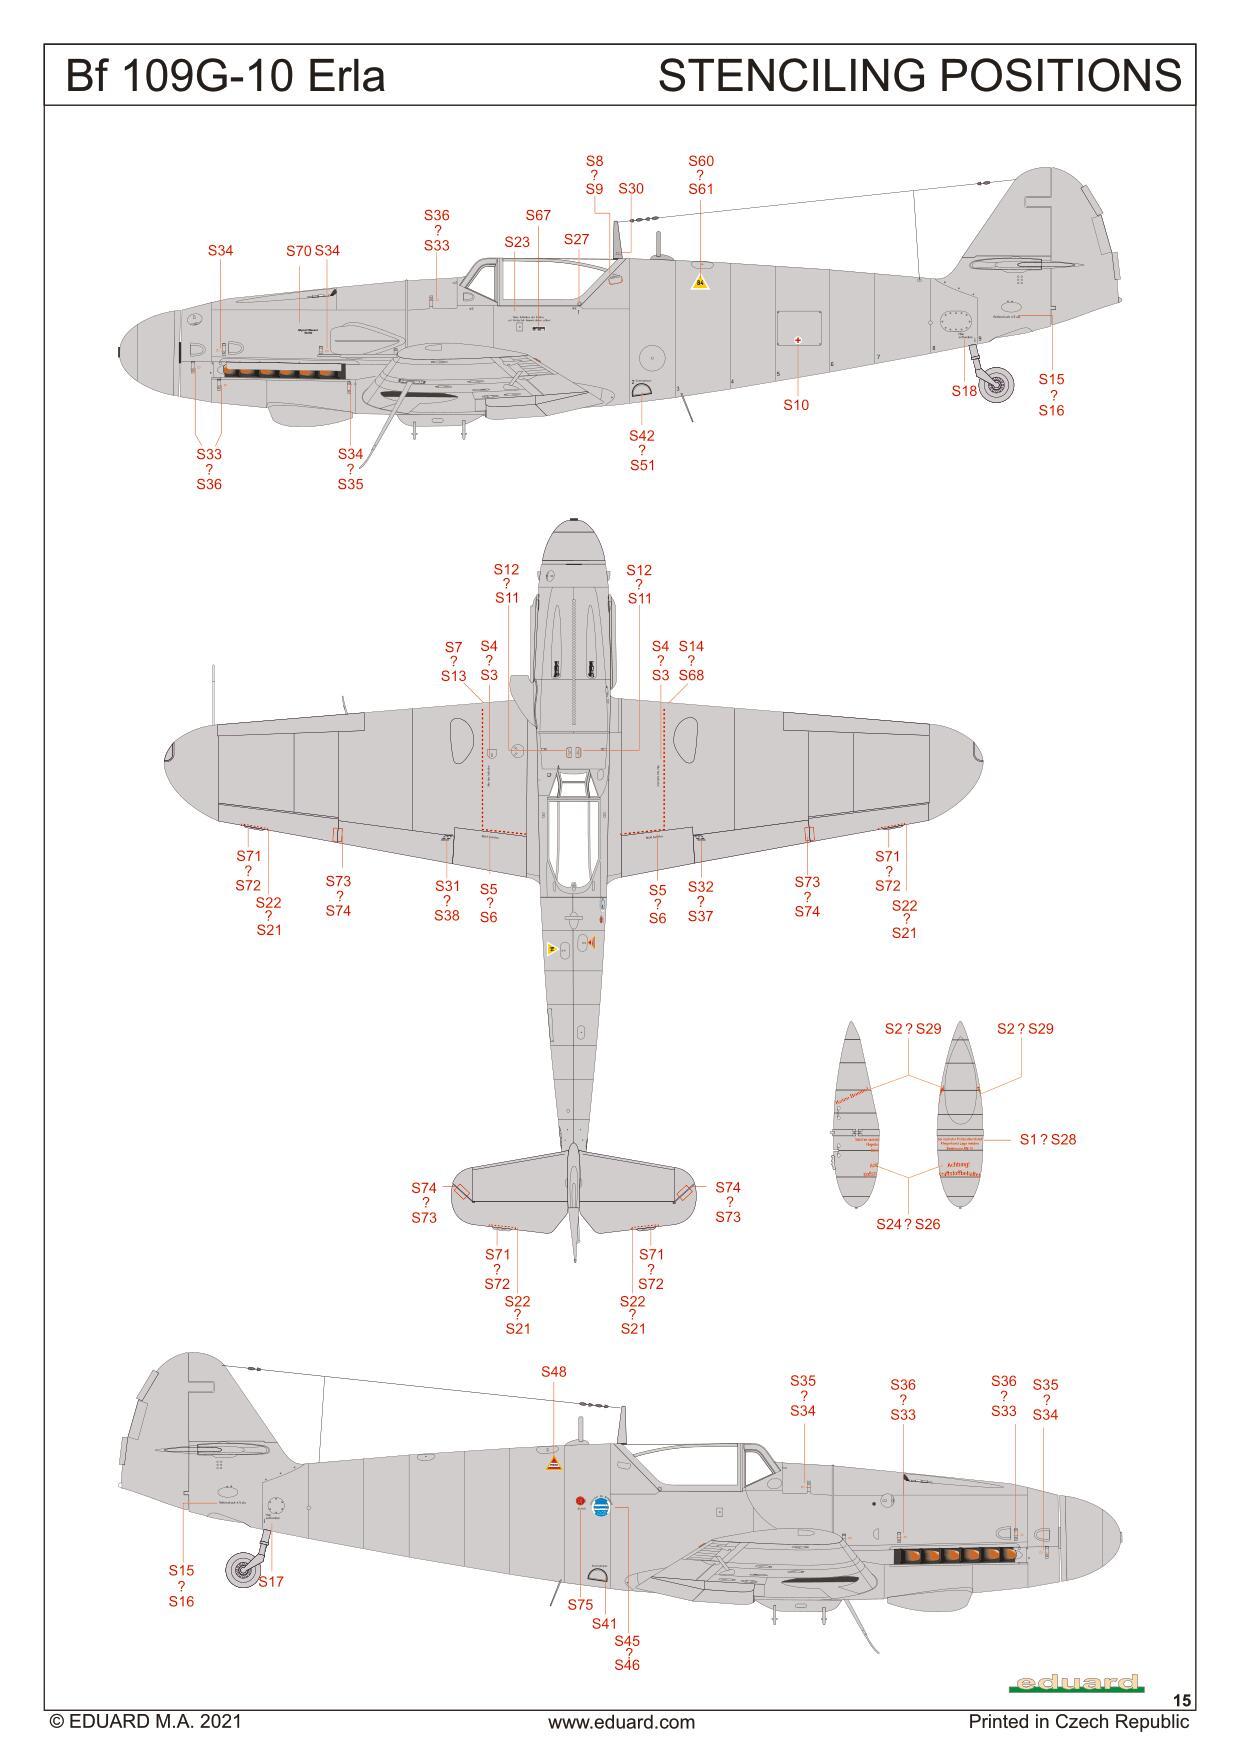 Eduard-84174-Bf-109-G-10-Erla-Bauanleitung-15 Messerschmitt Bf 109 G-10 Erla in 1:48 von Eduard # 84174